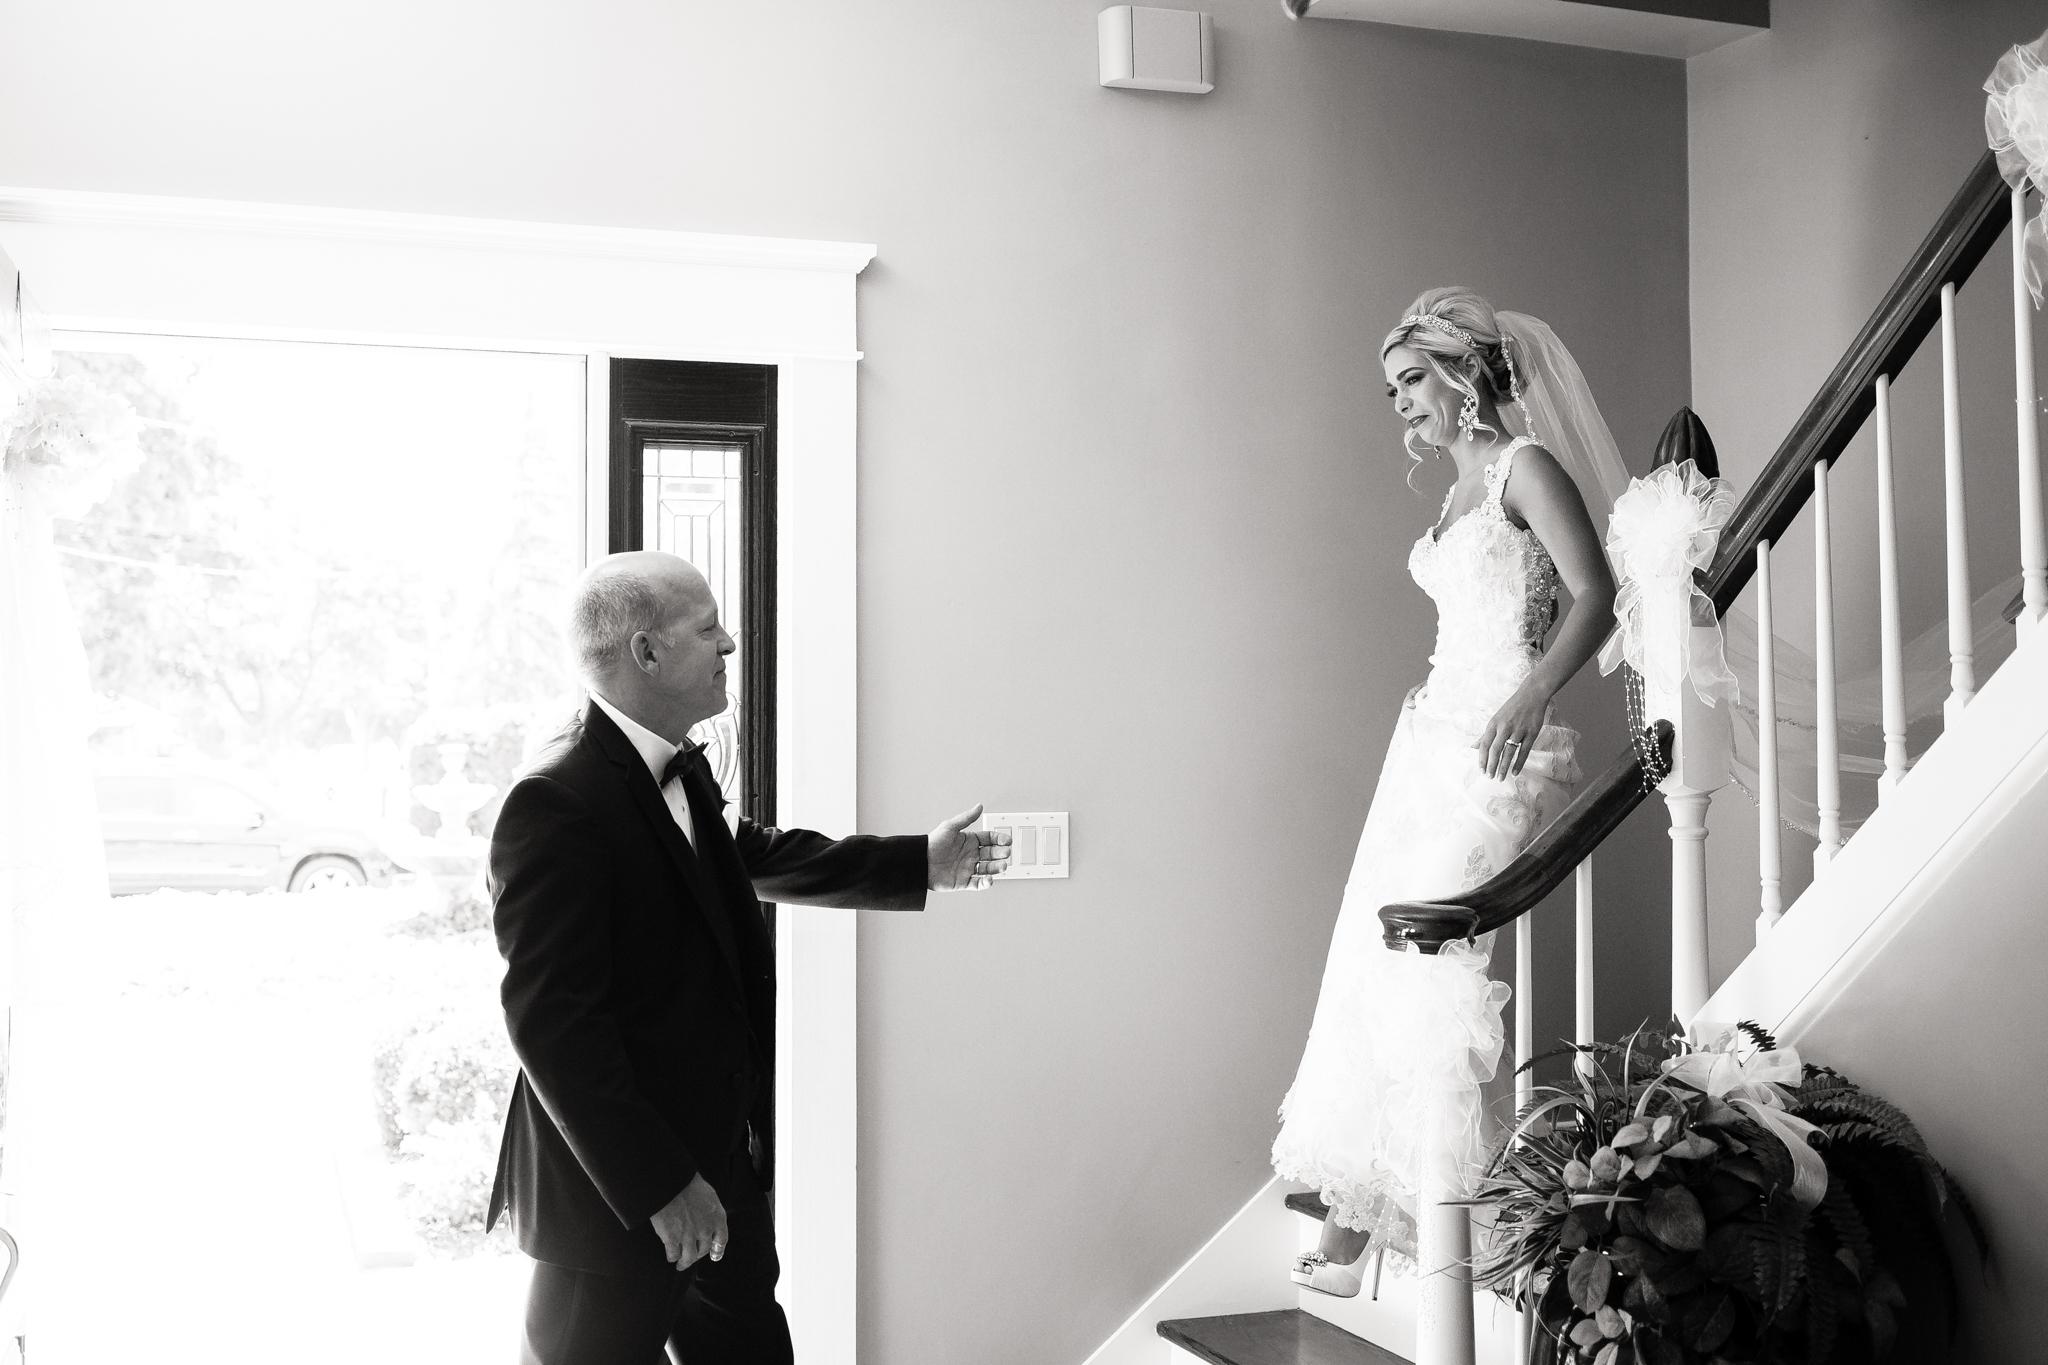 Statler-City-Buffalo-wedding-photographer- 0080bw.jpg